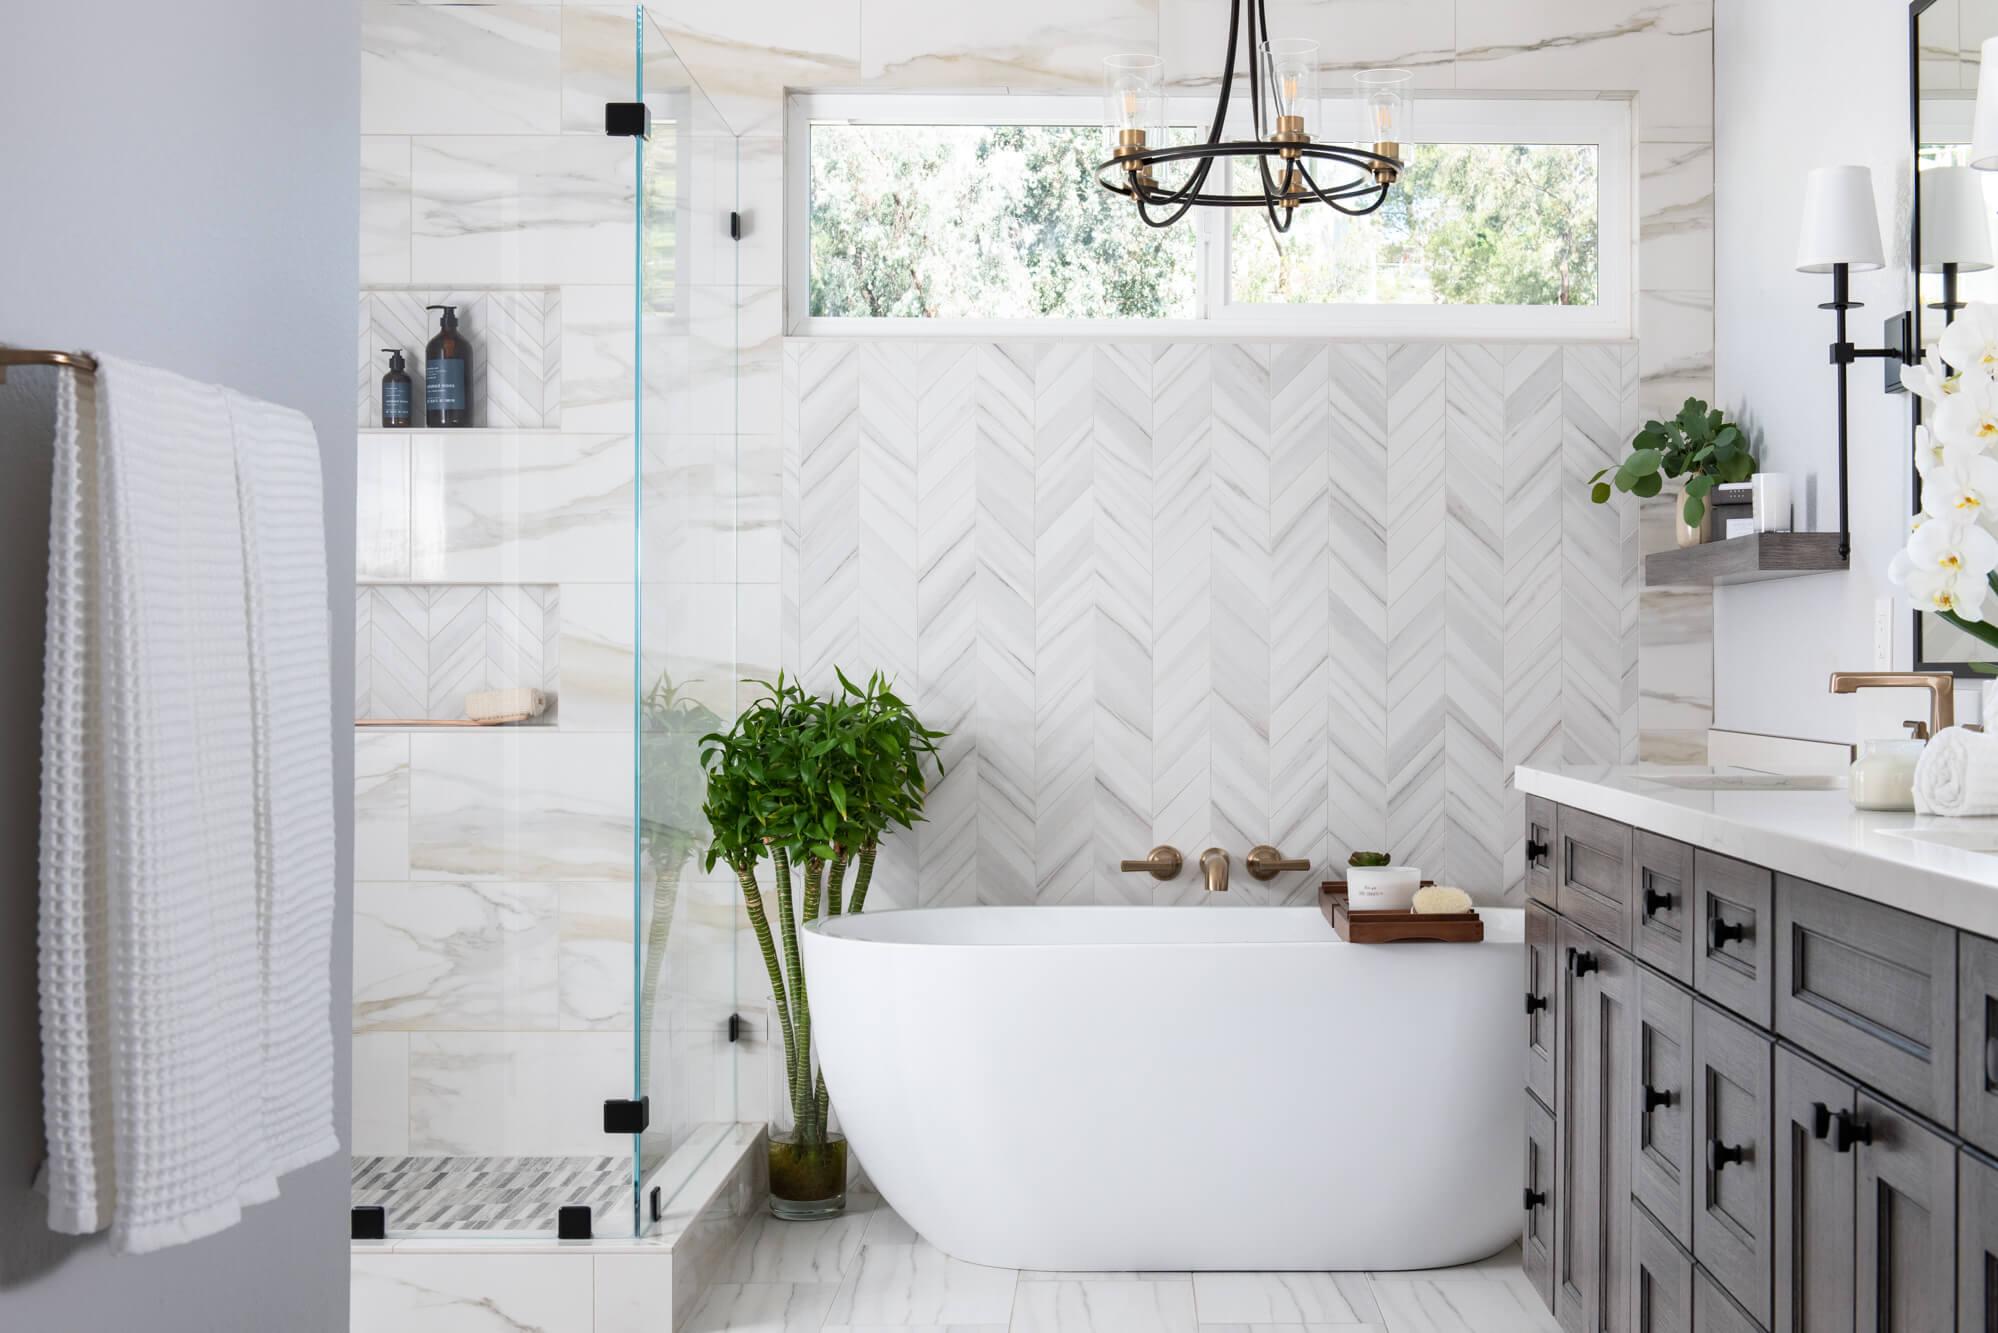 Hiring a bathroom remodeling contractor in Orange County